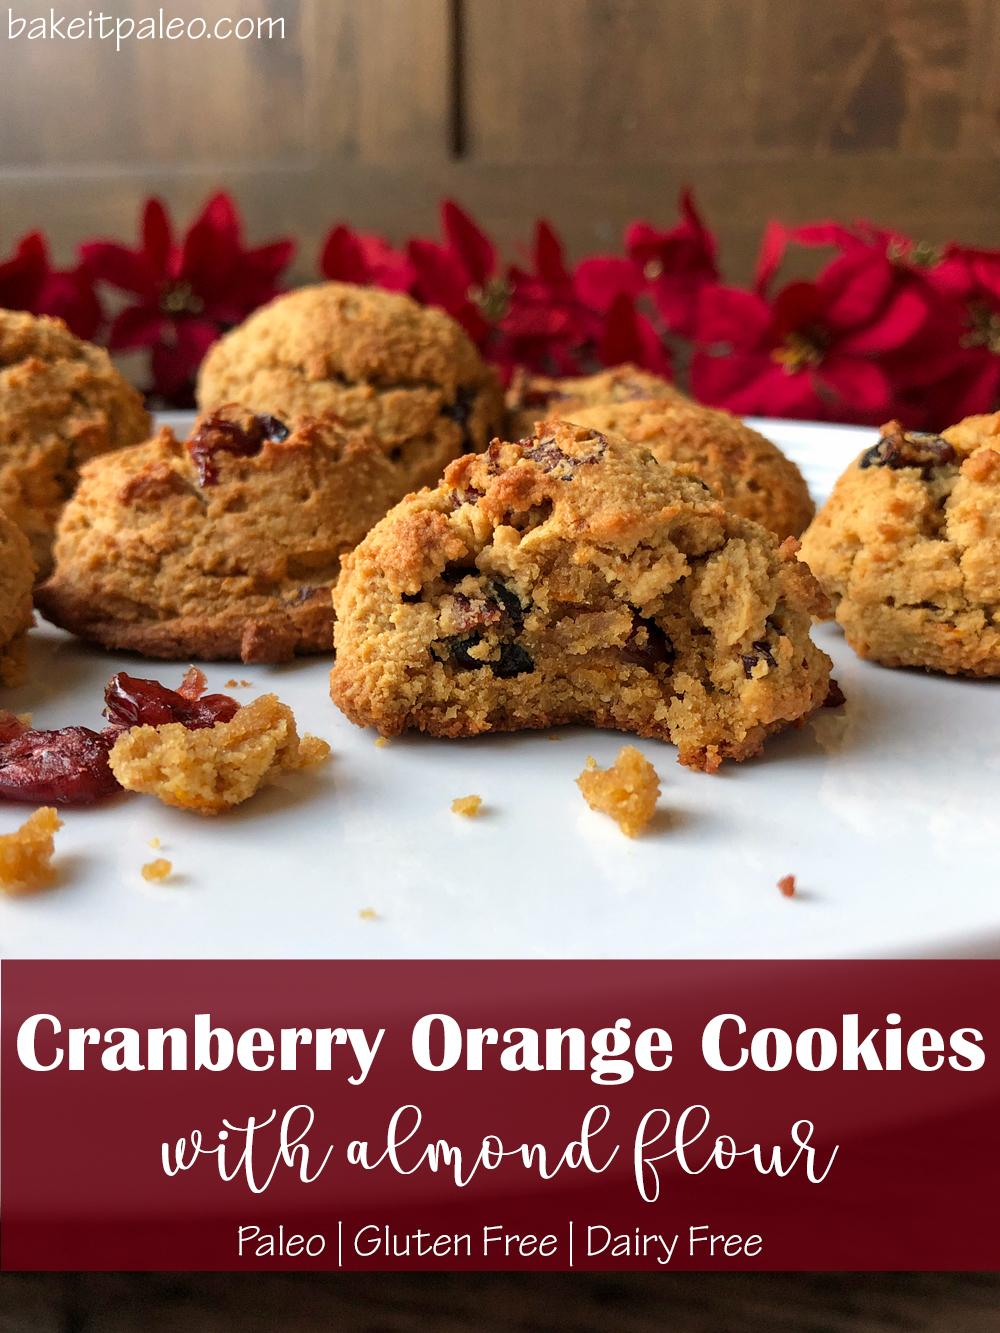 Paleo-Cranberry-Orange-Cookies-with-Almond-Flour